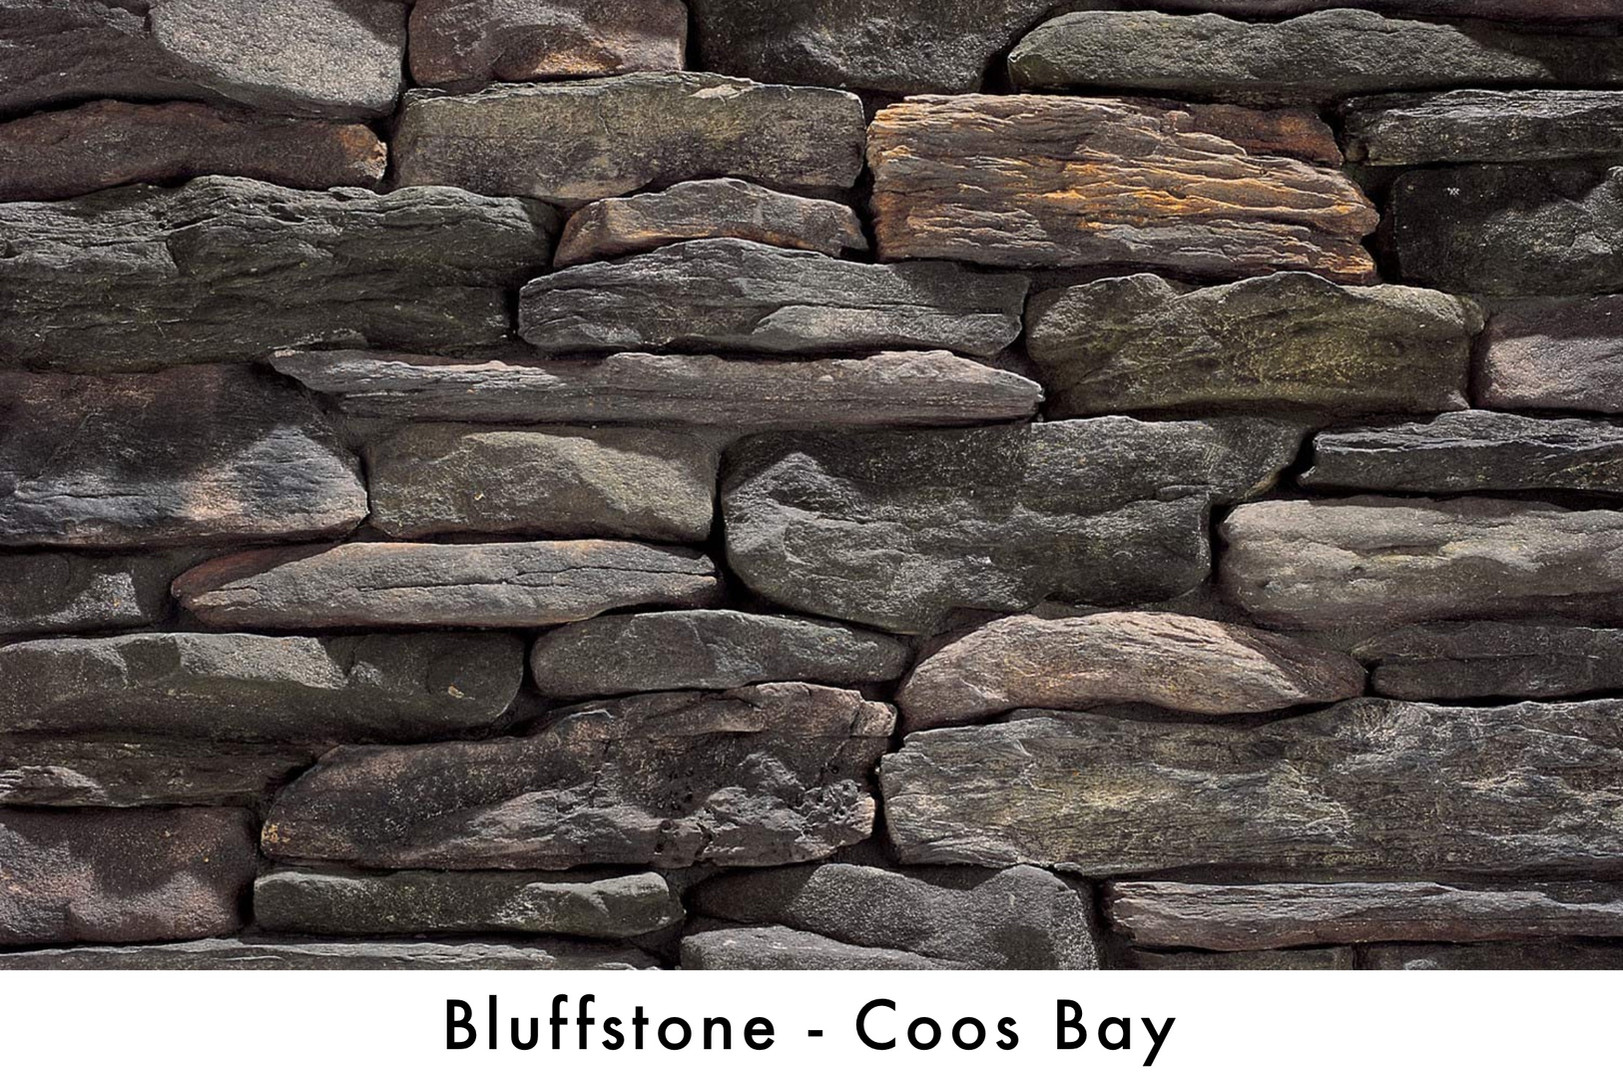 Bluffstone - Coos Bay